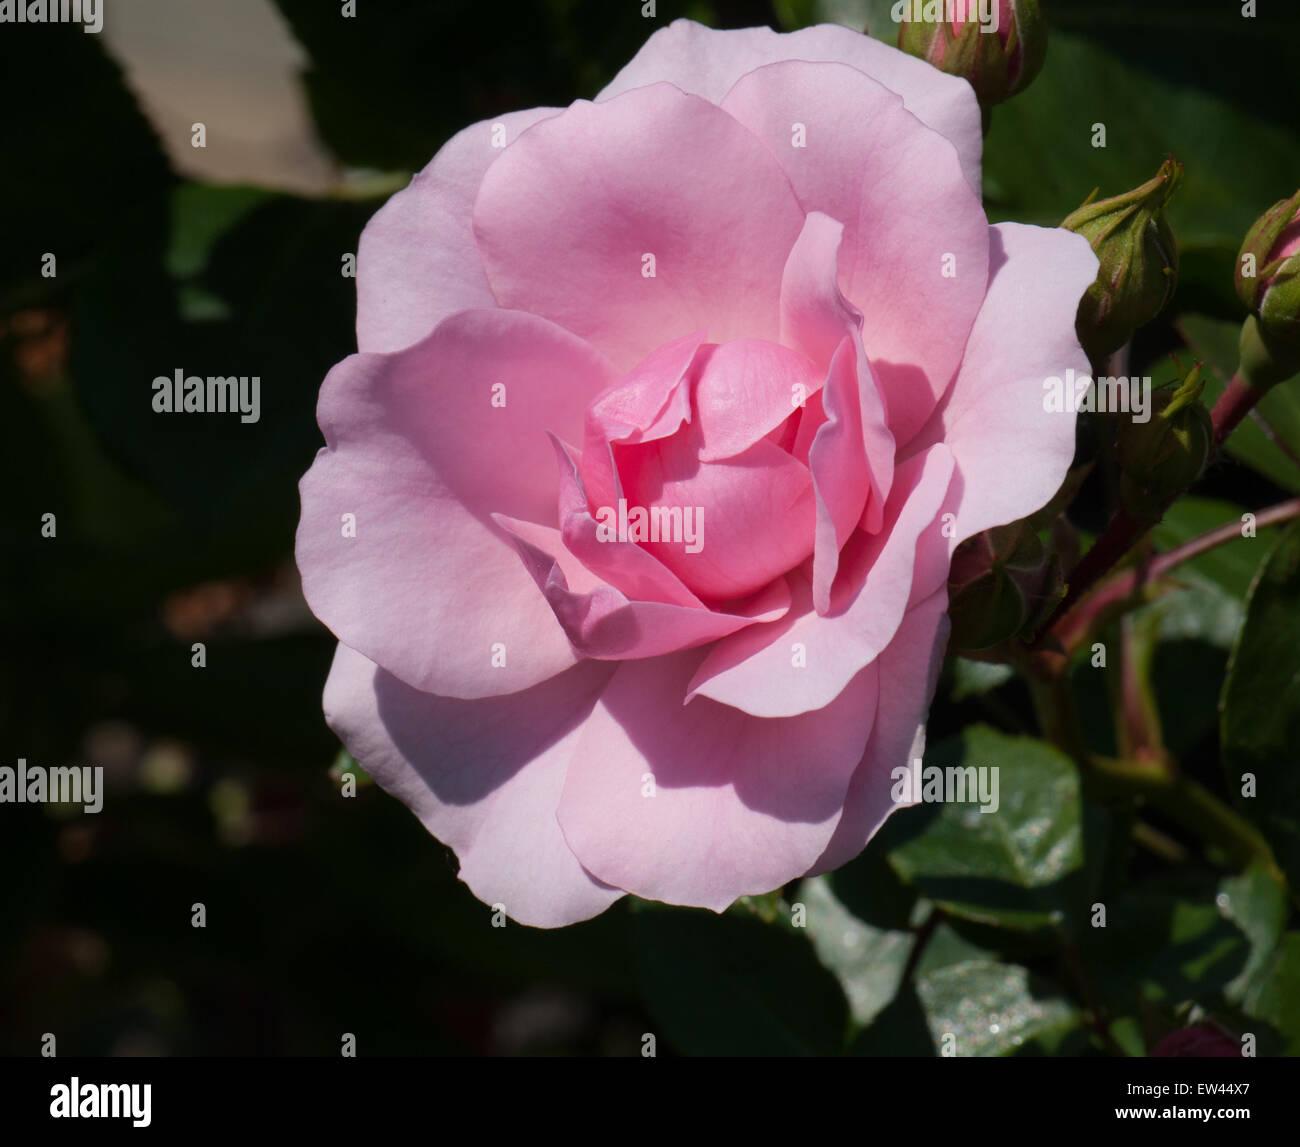 Standard rose flower carpet pink stock photo 84299551 alamy standard rose flower carpet pink mightylinksfo